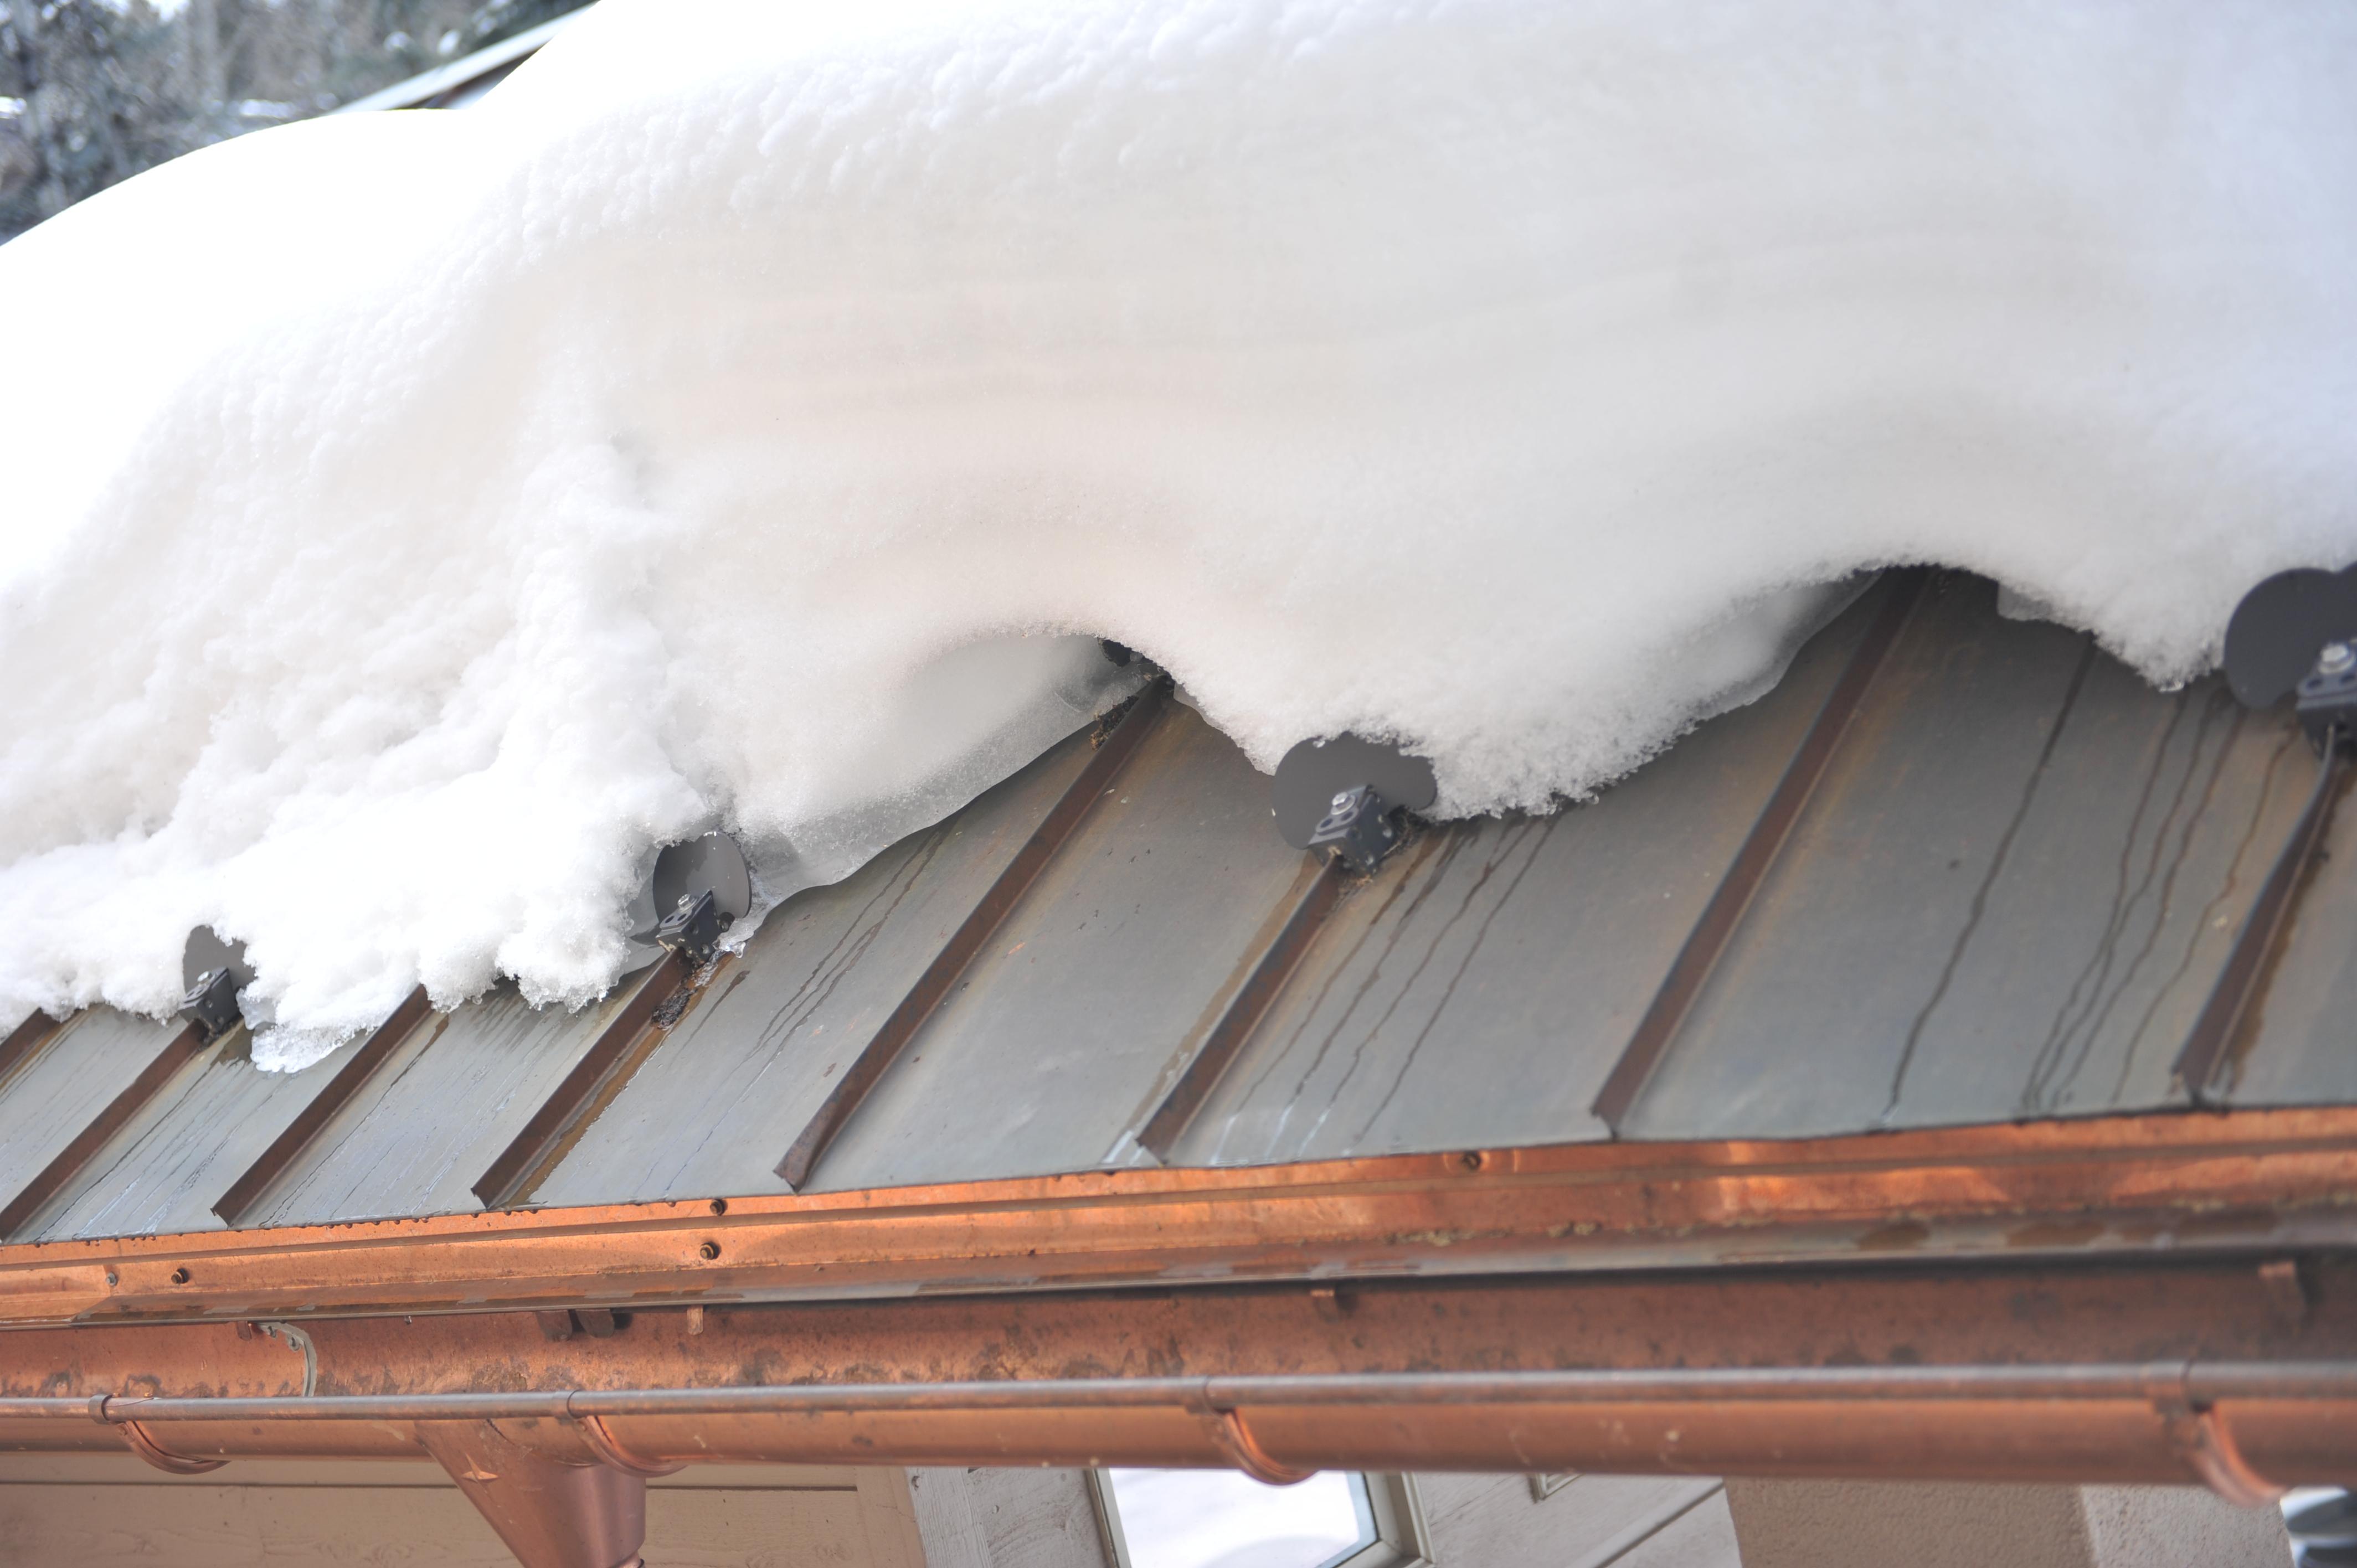 Corrugated Metal Heated Roof Photos Roof Ice Melt